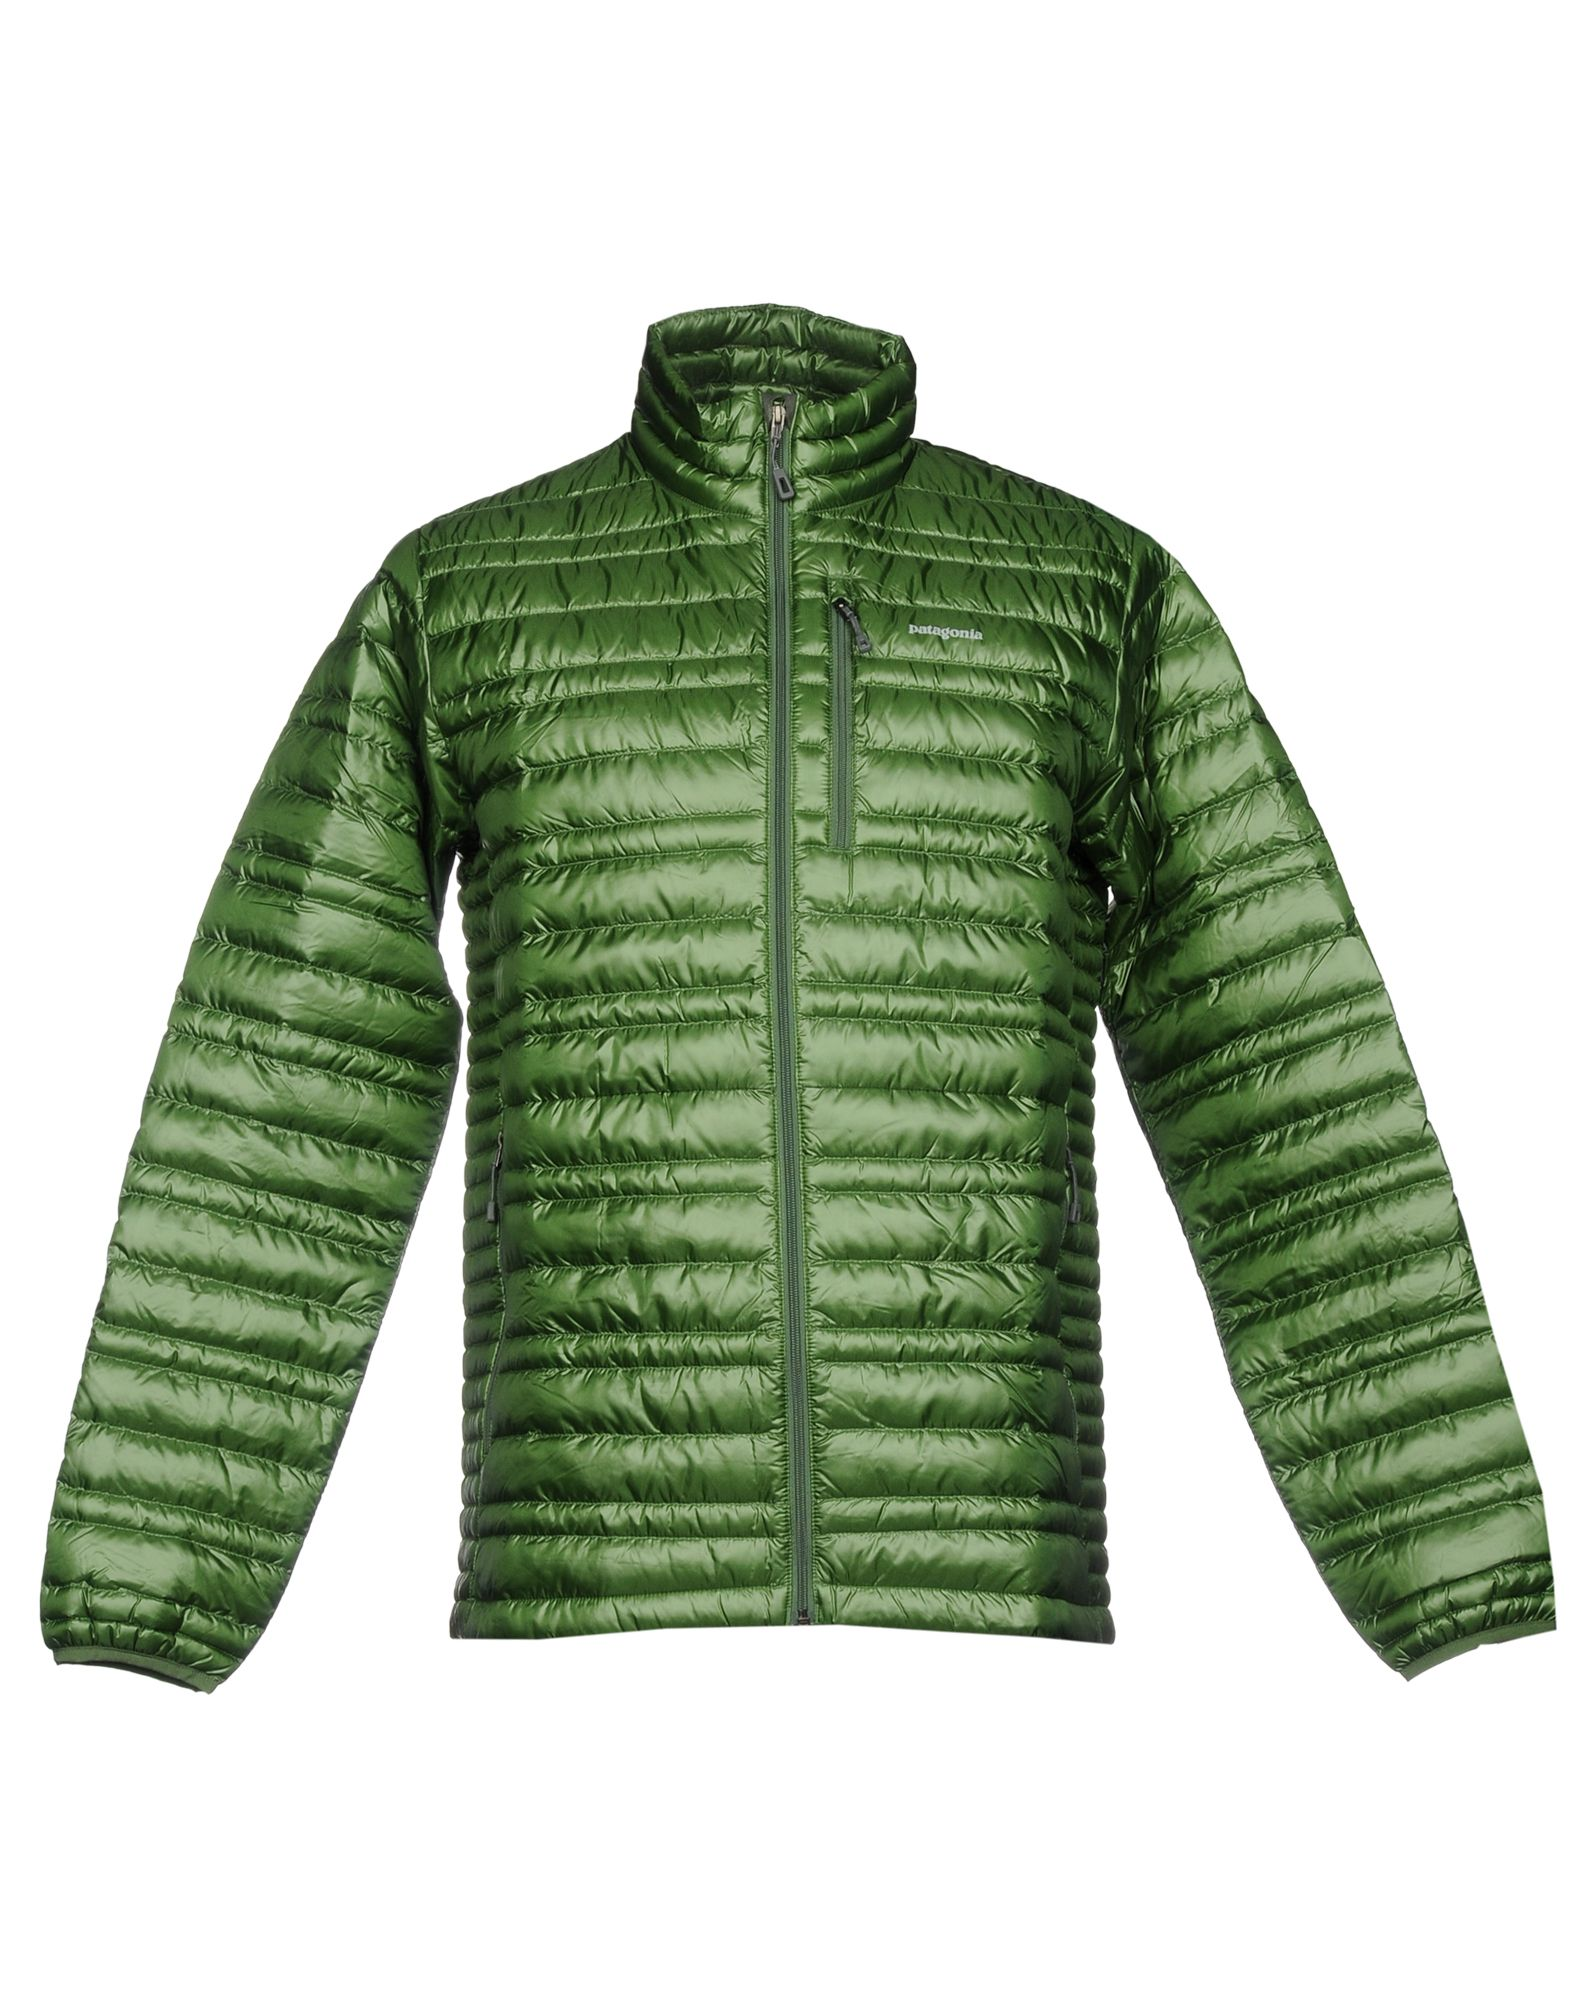 Piumino Patagonia Ms Ultralight Down Jacket - Uomo - Acquista online su